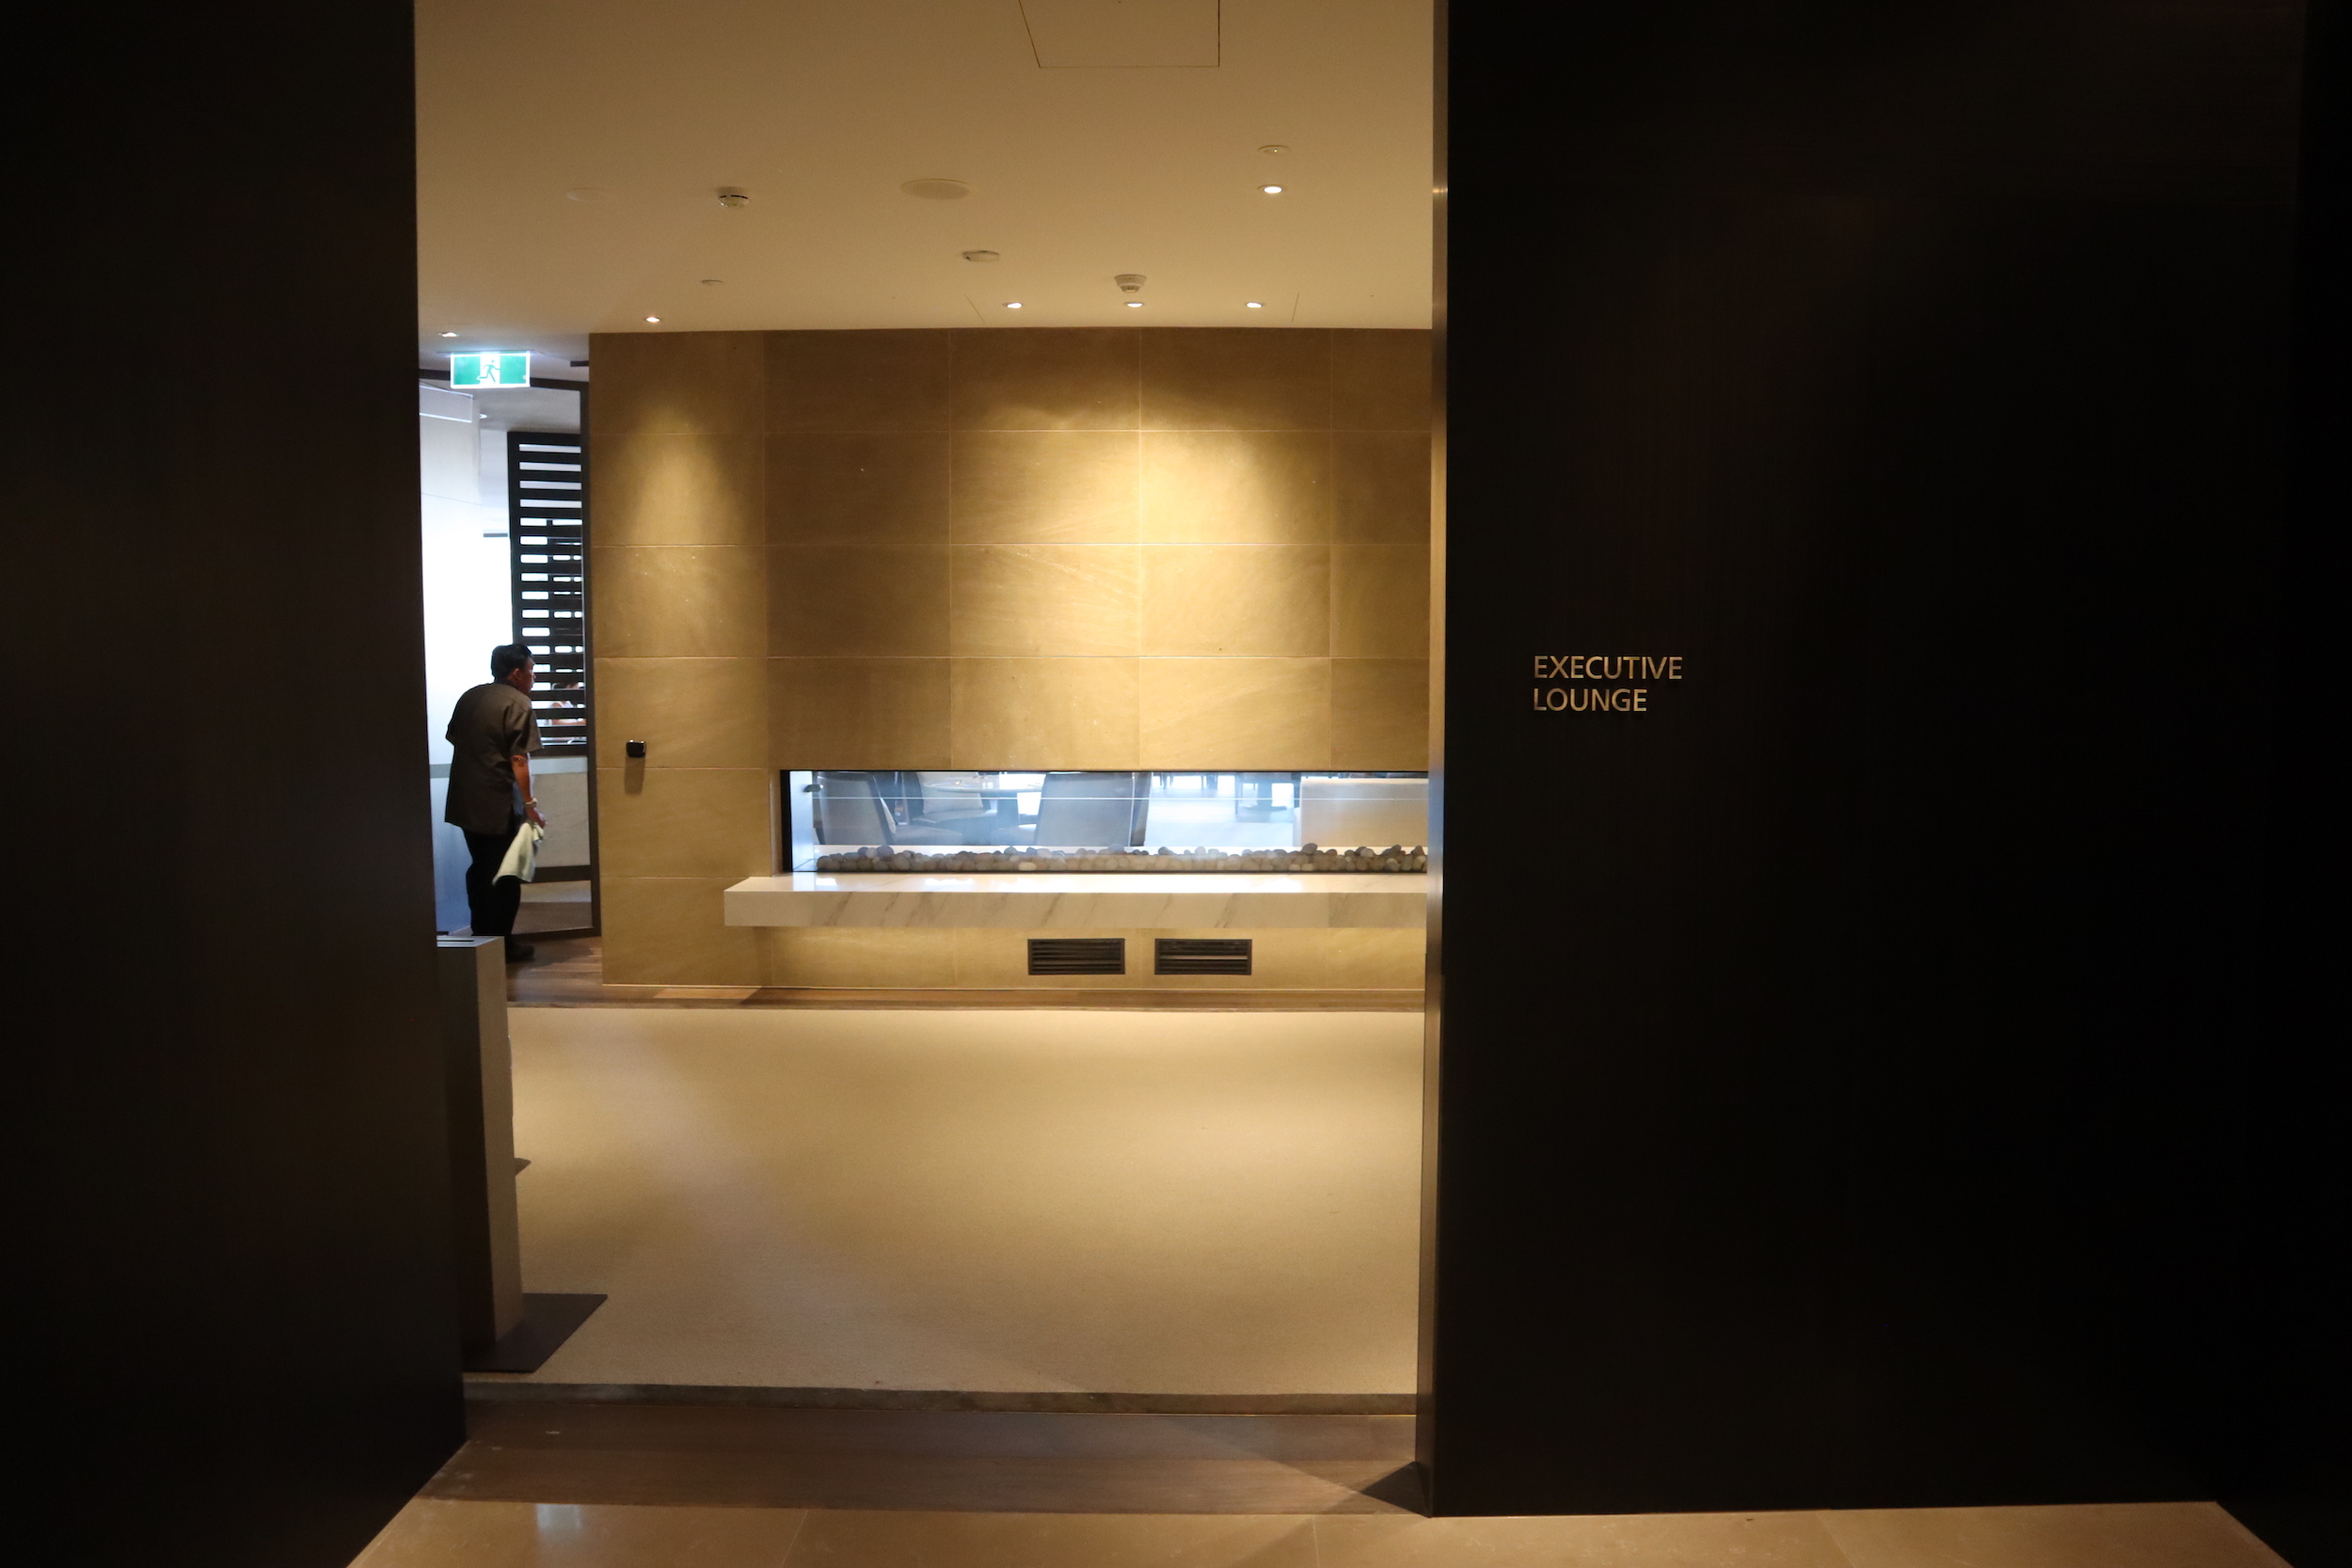 Westin Perth – Executive Lounge